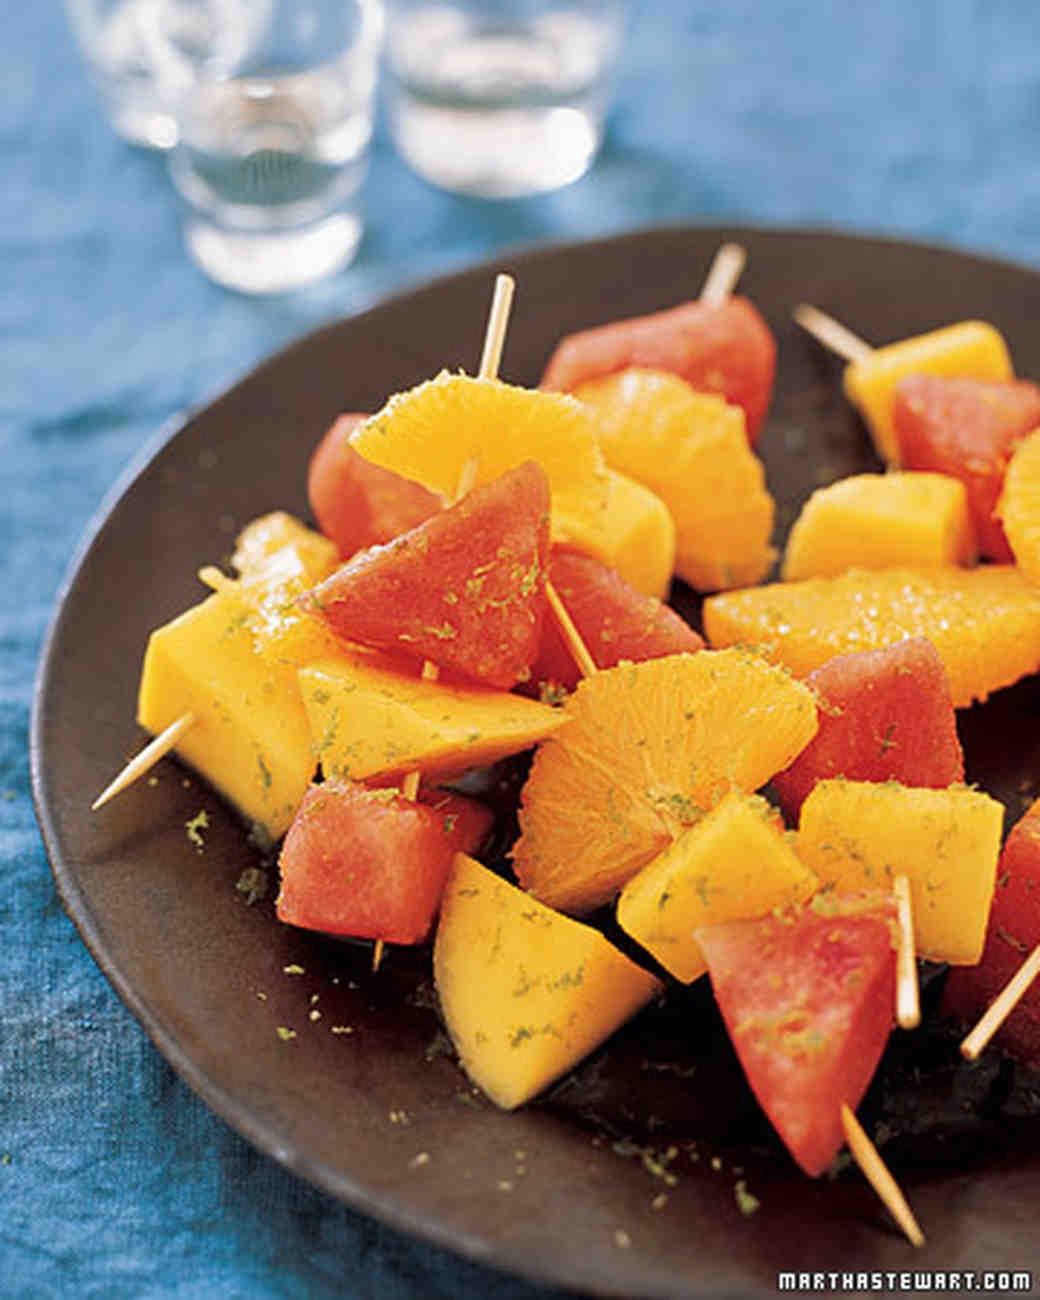 mpa103073_0707_fruit.jpg